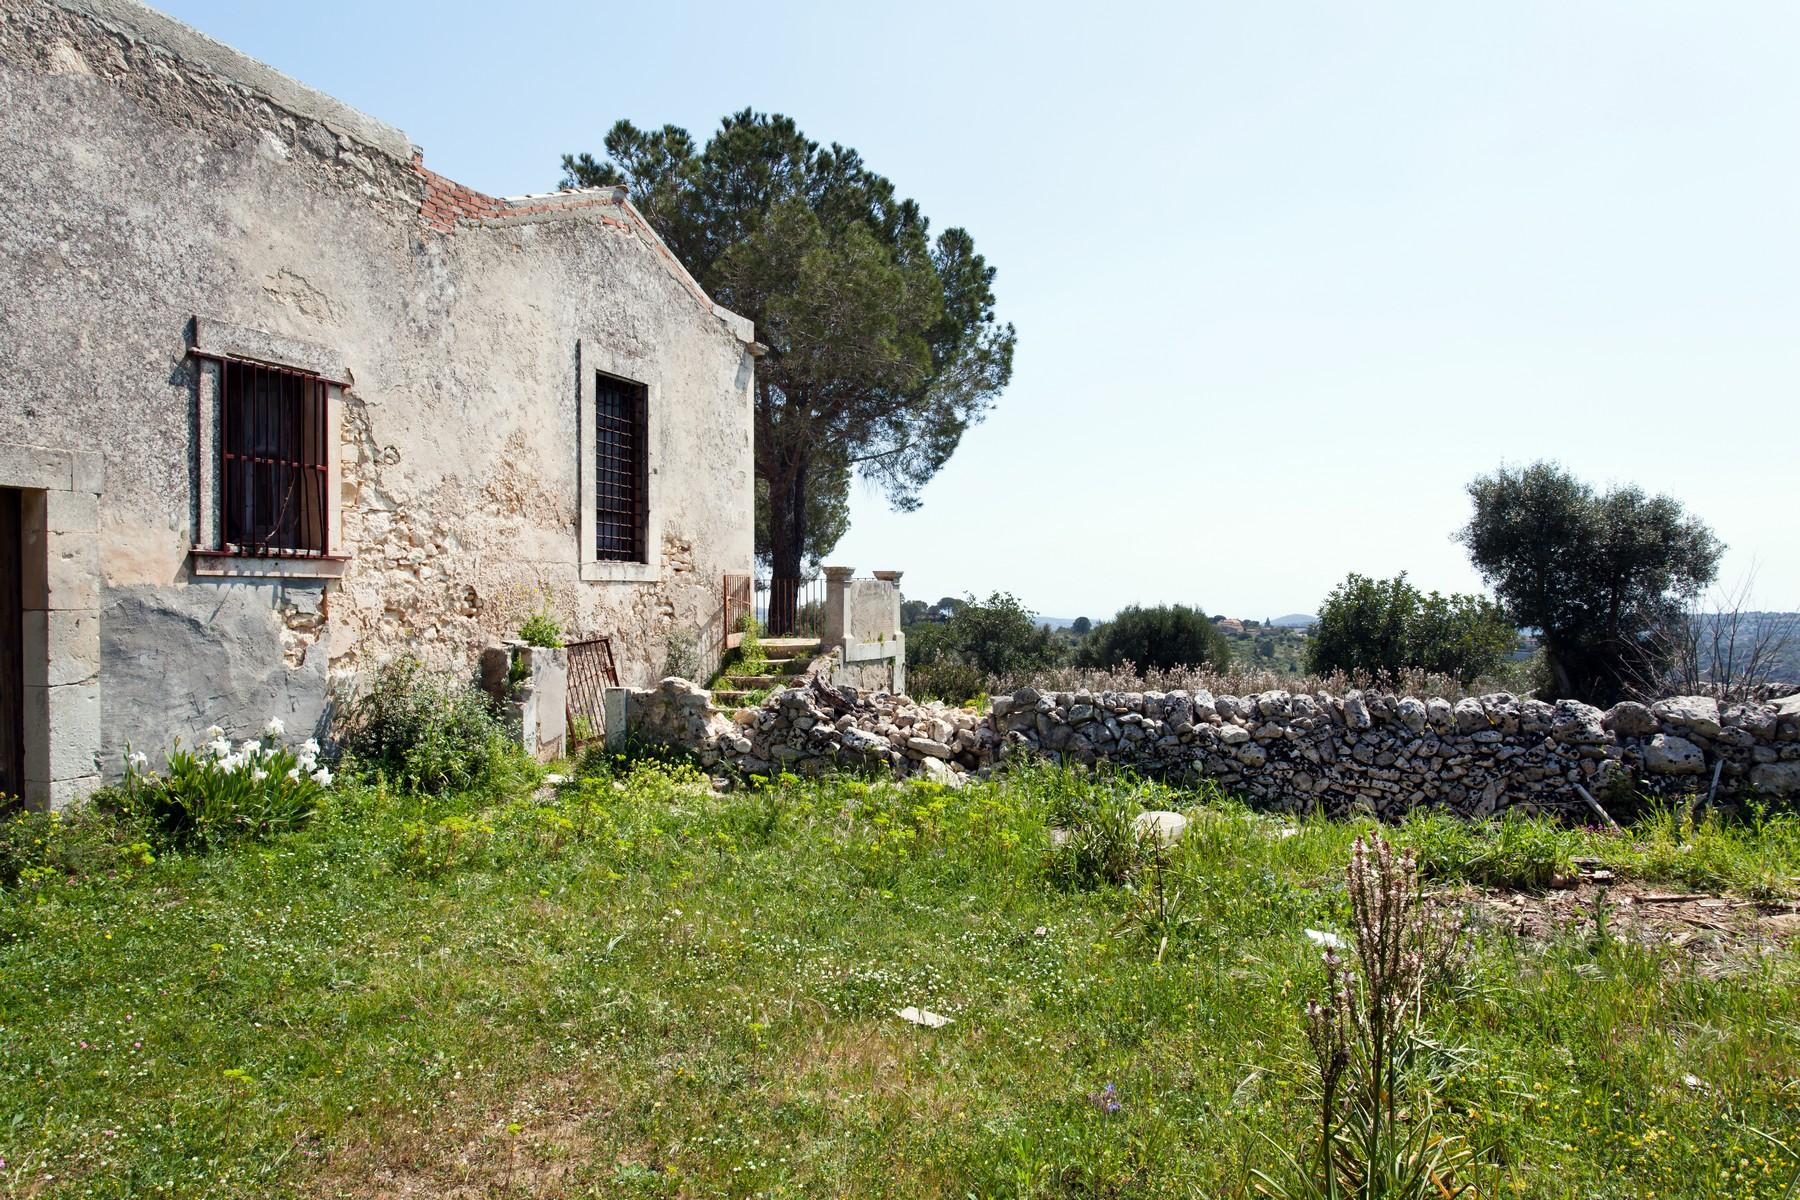 Casa indipendente in Vendita a Noto: 5 locali, 1000 mq - Foto 4